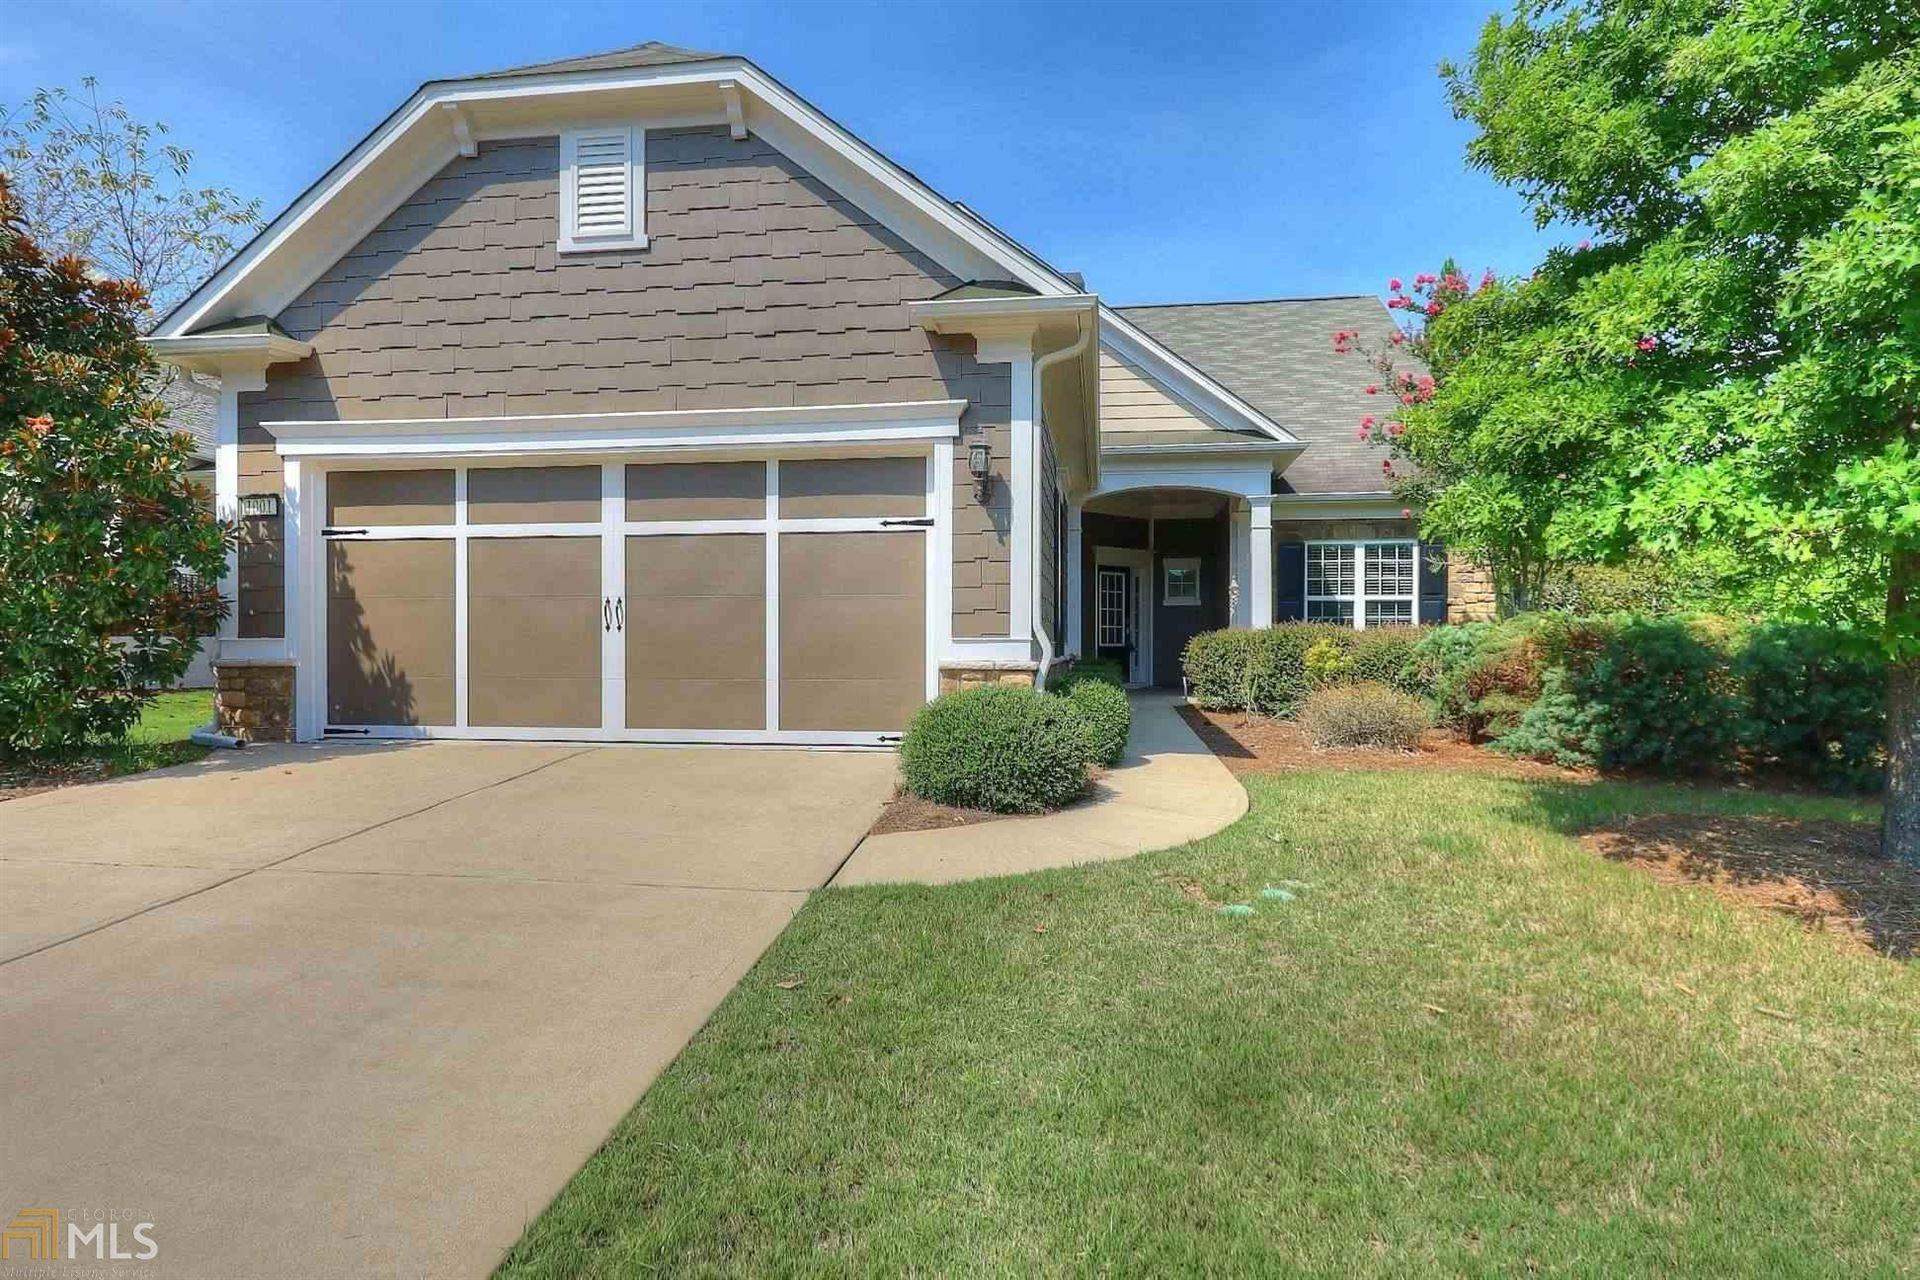 1001 Creekwood Pl, Greensboro, GA 30642 - MLS#: 8841974